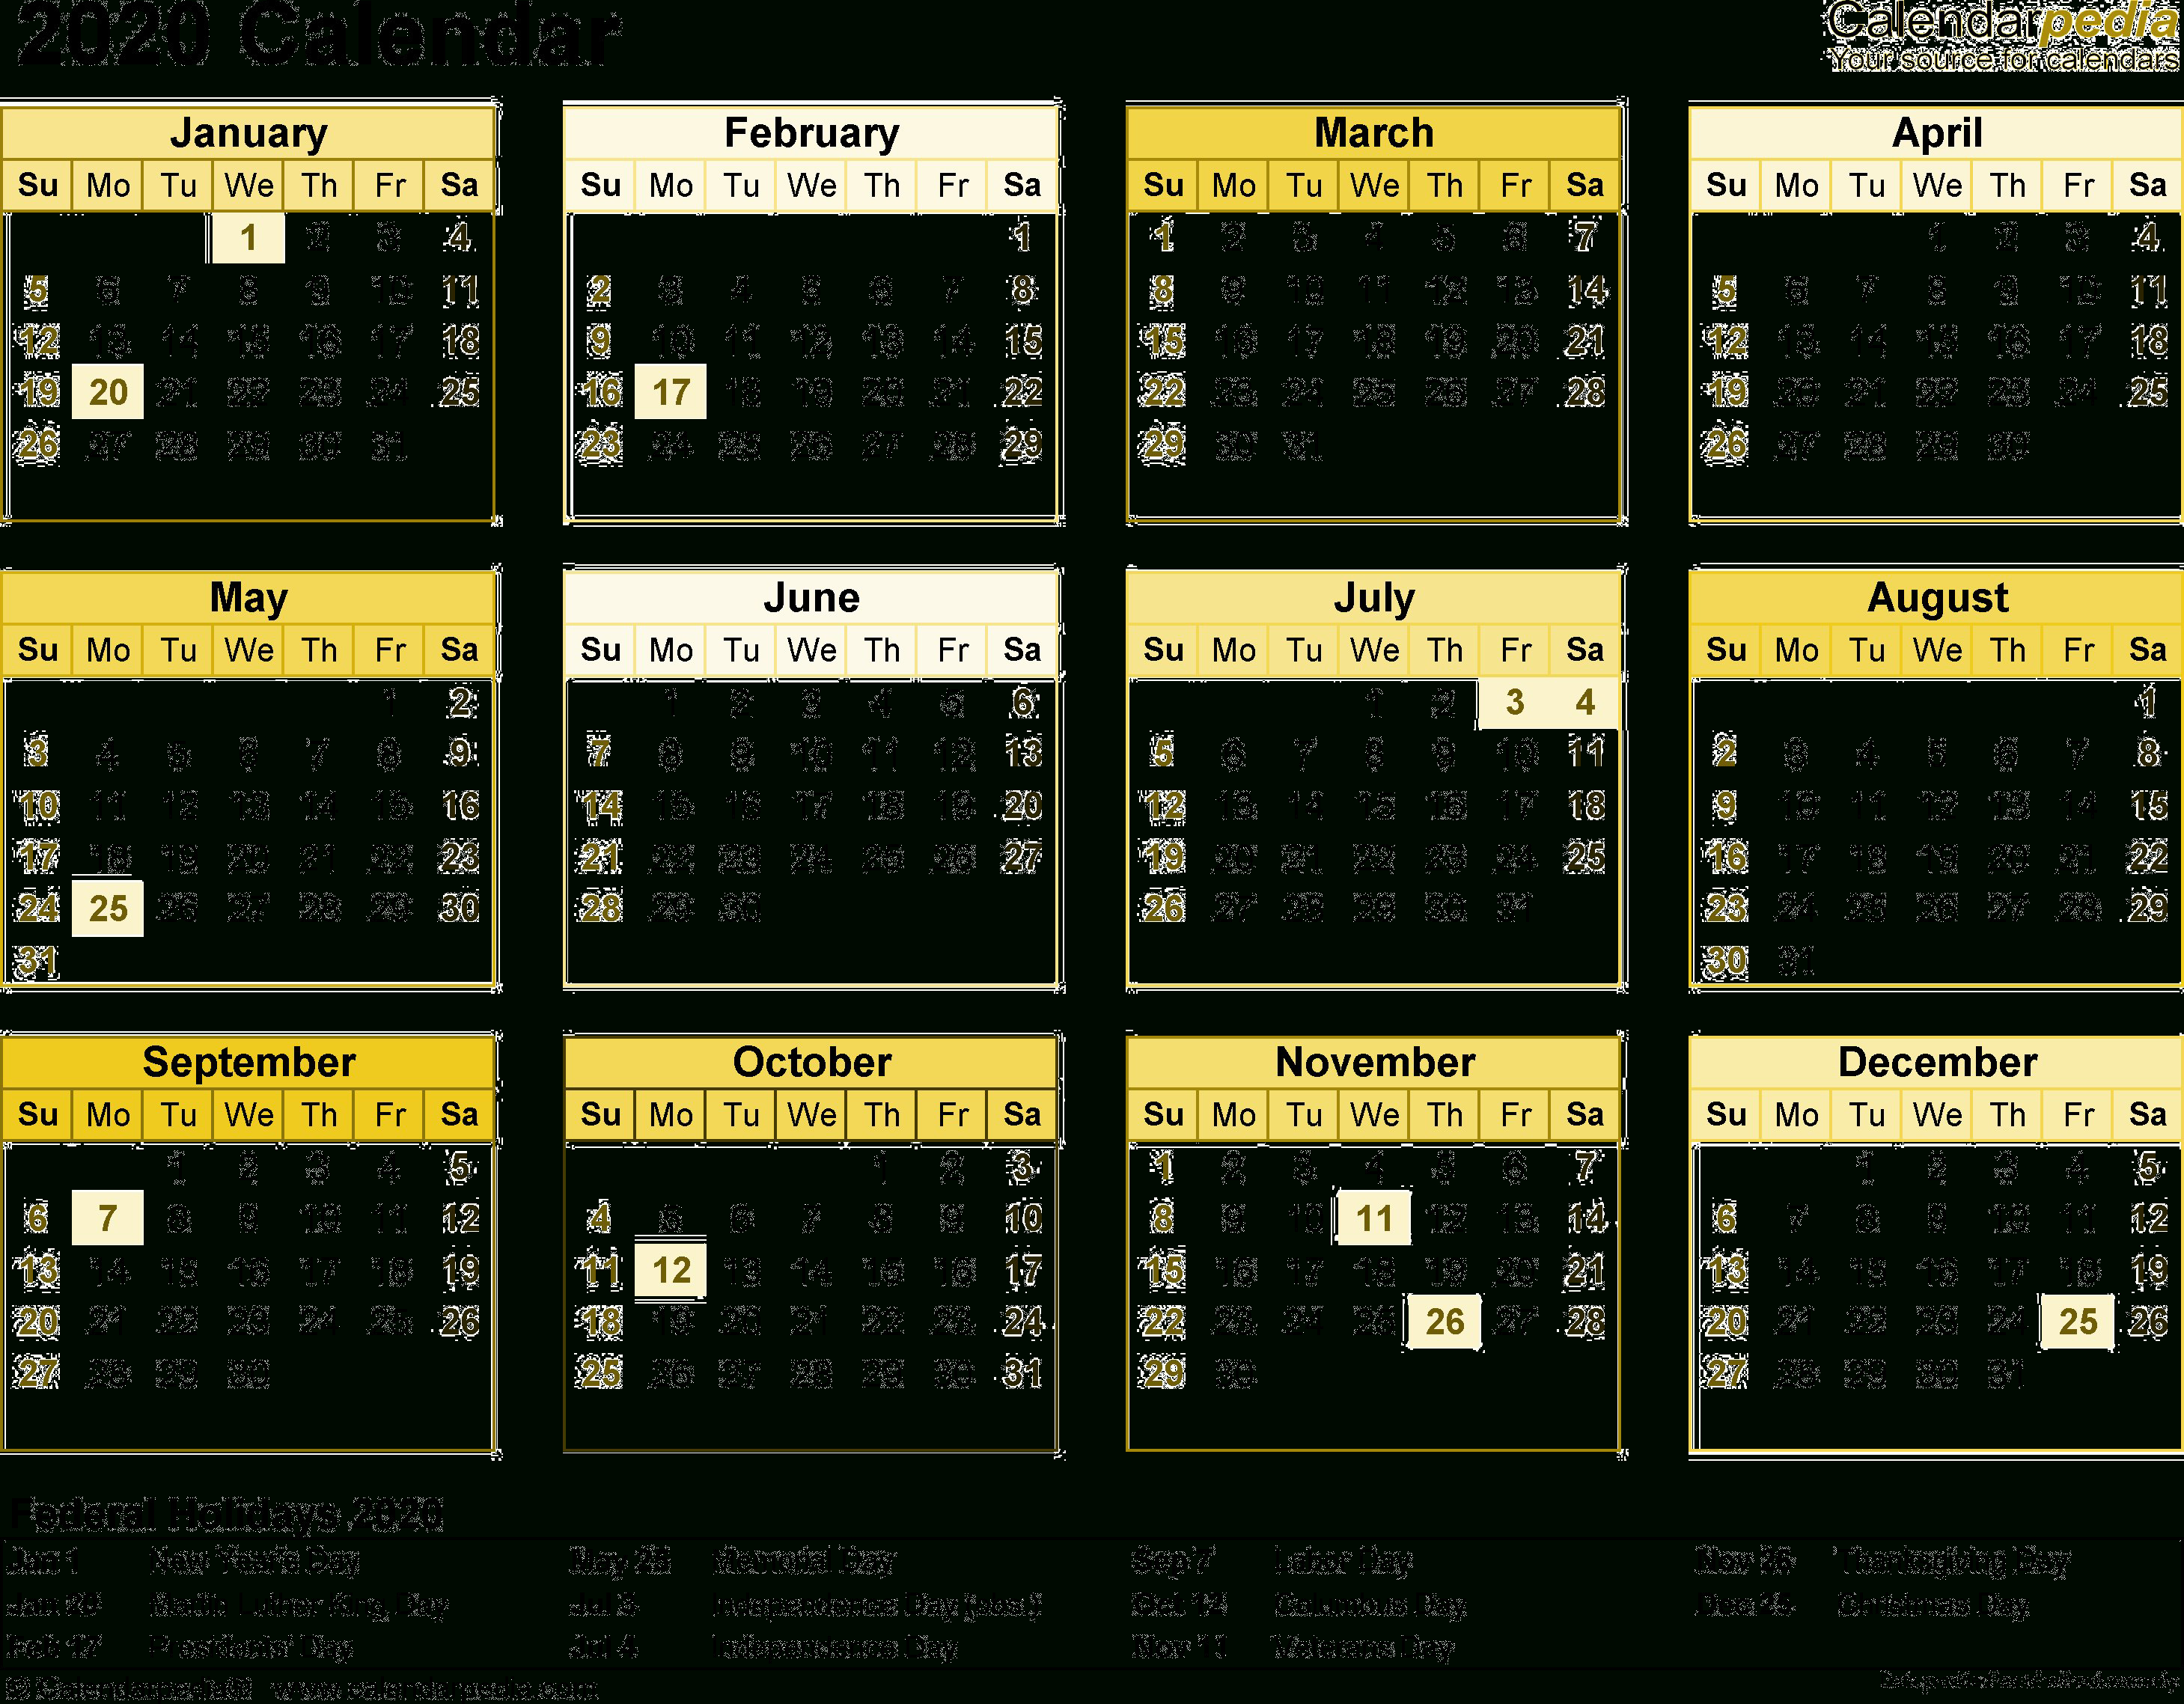 2020 Calendar Png Transparent Images